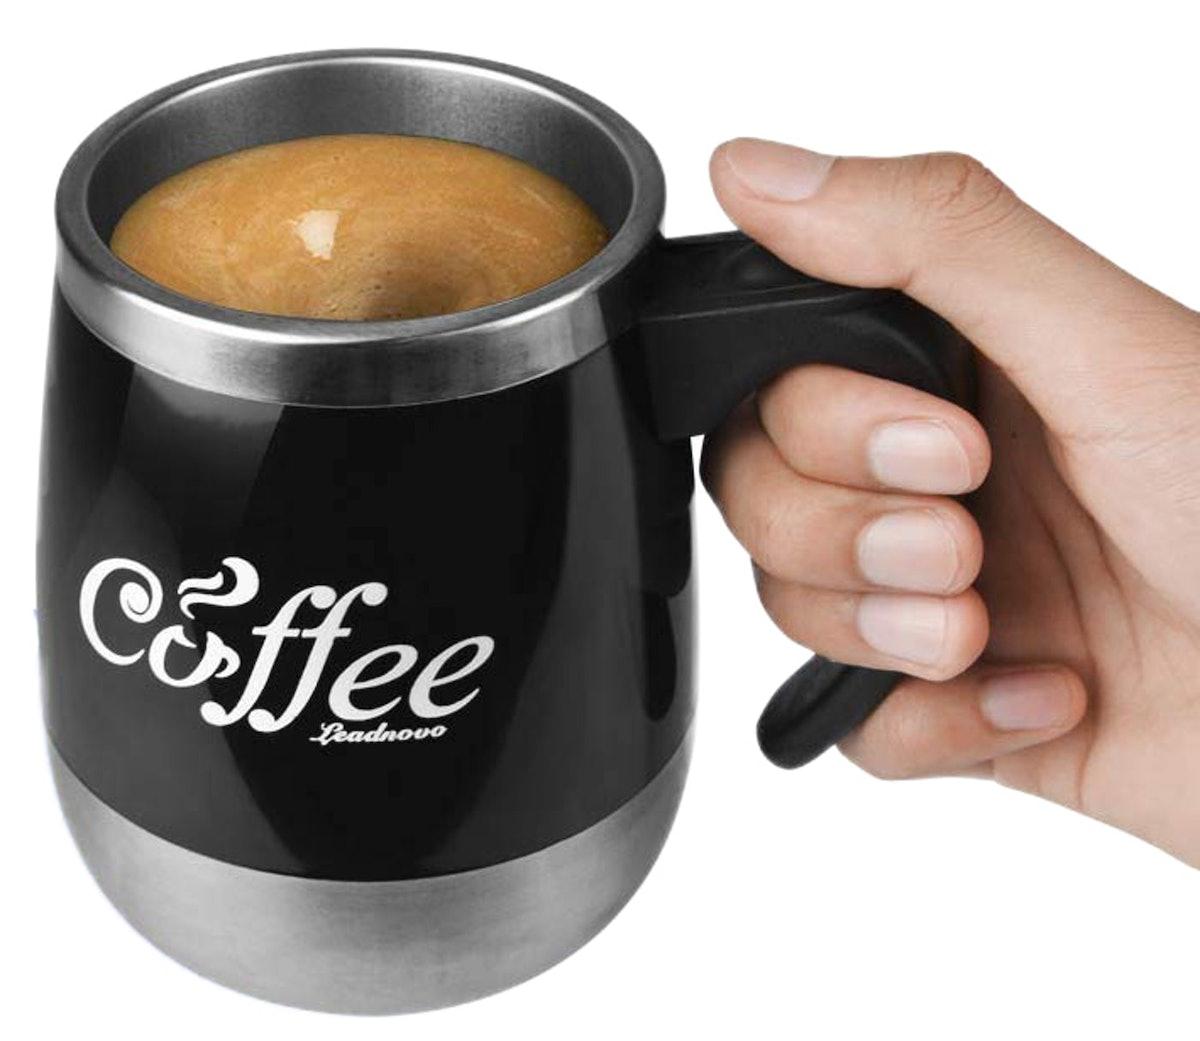 LEADNOVO Self-Stirring Coffee Mug